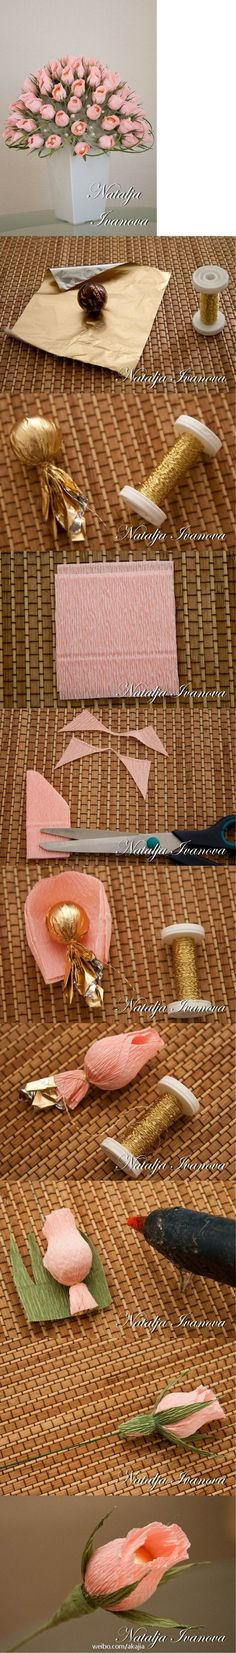 DIY Romantic Chocolate Rose Bouquet DIY Projects | UsefulDIY.com